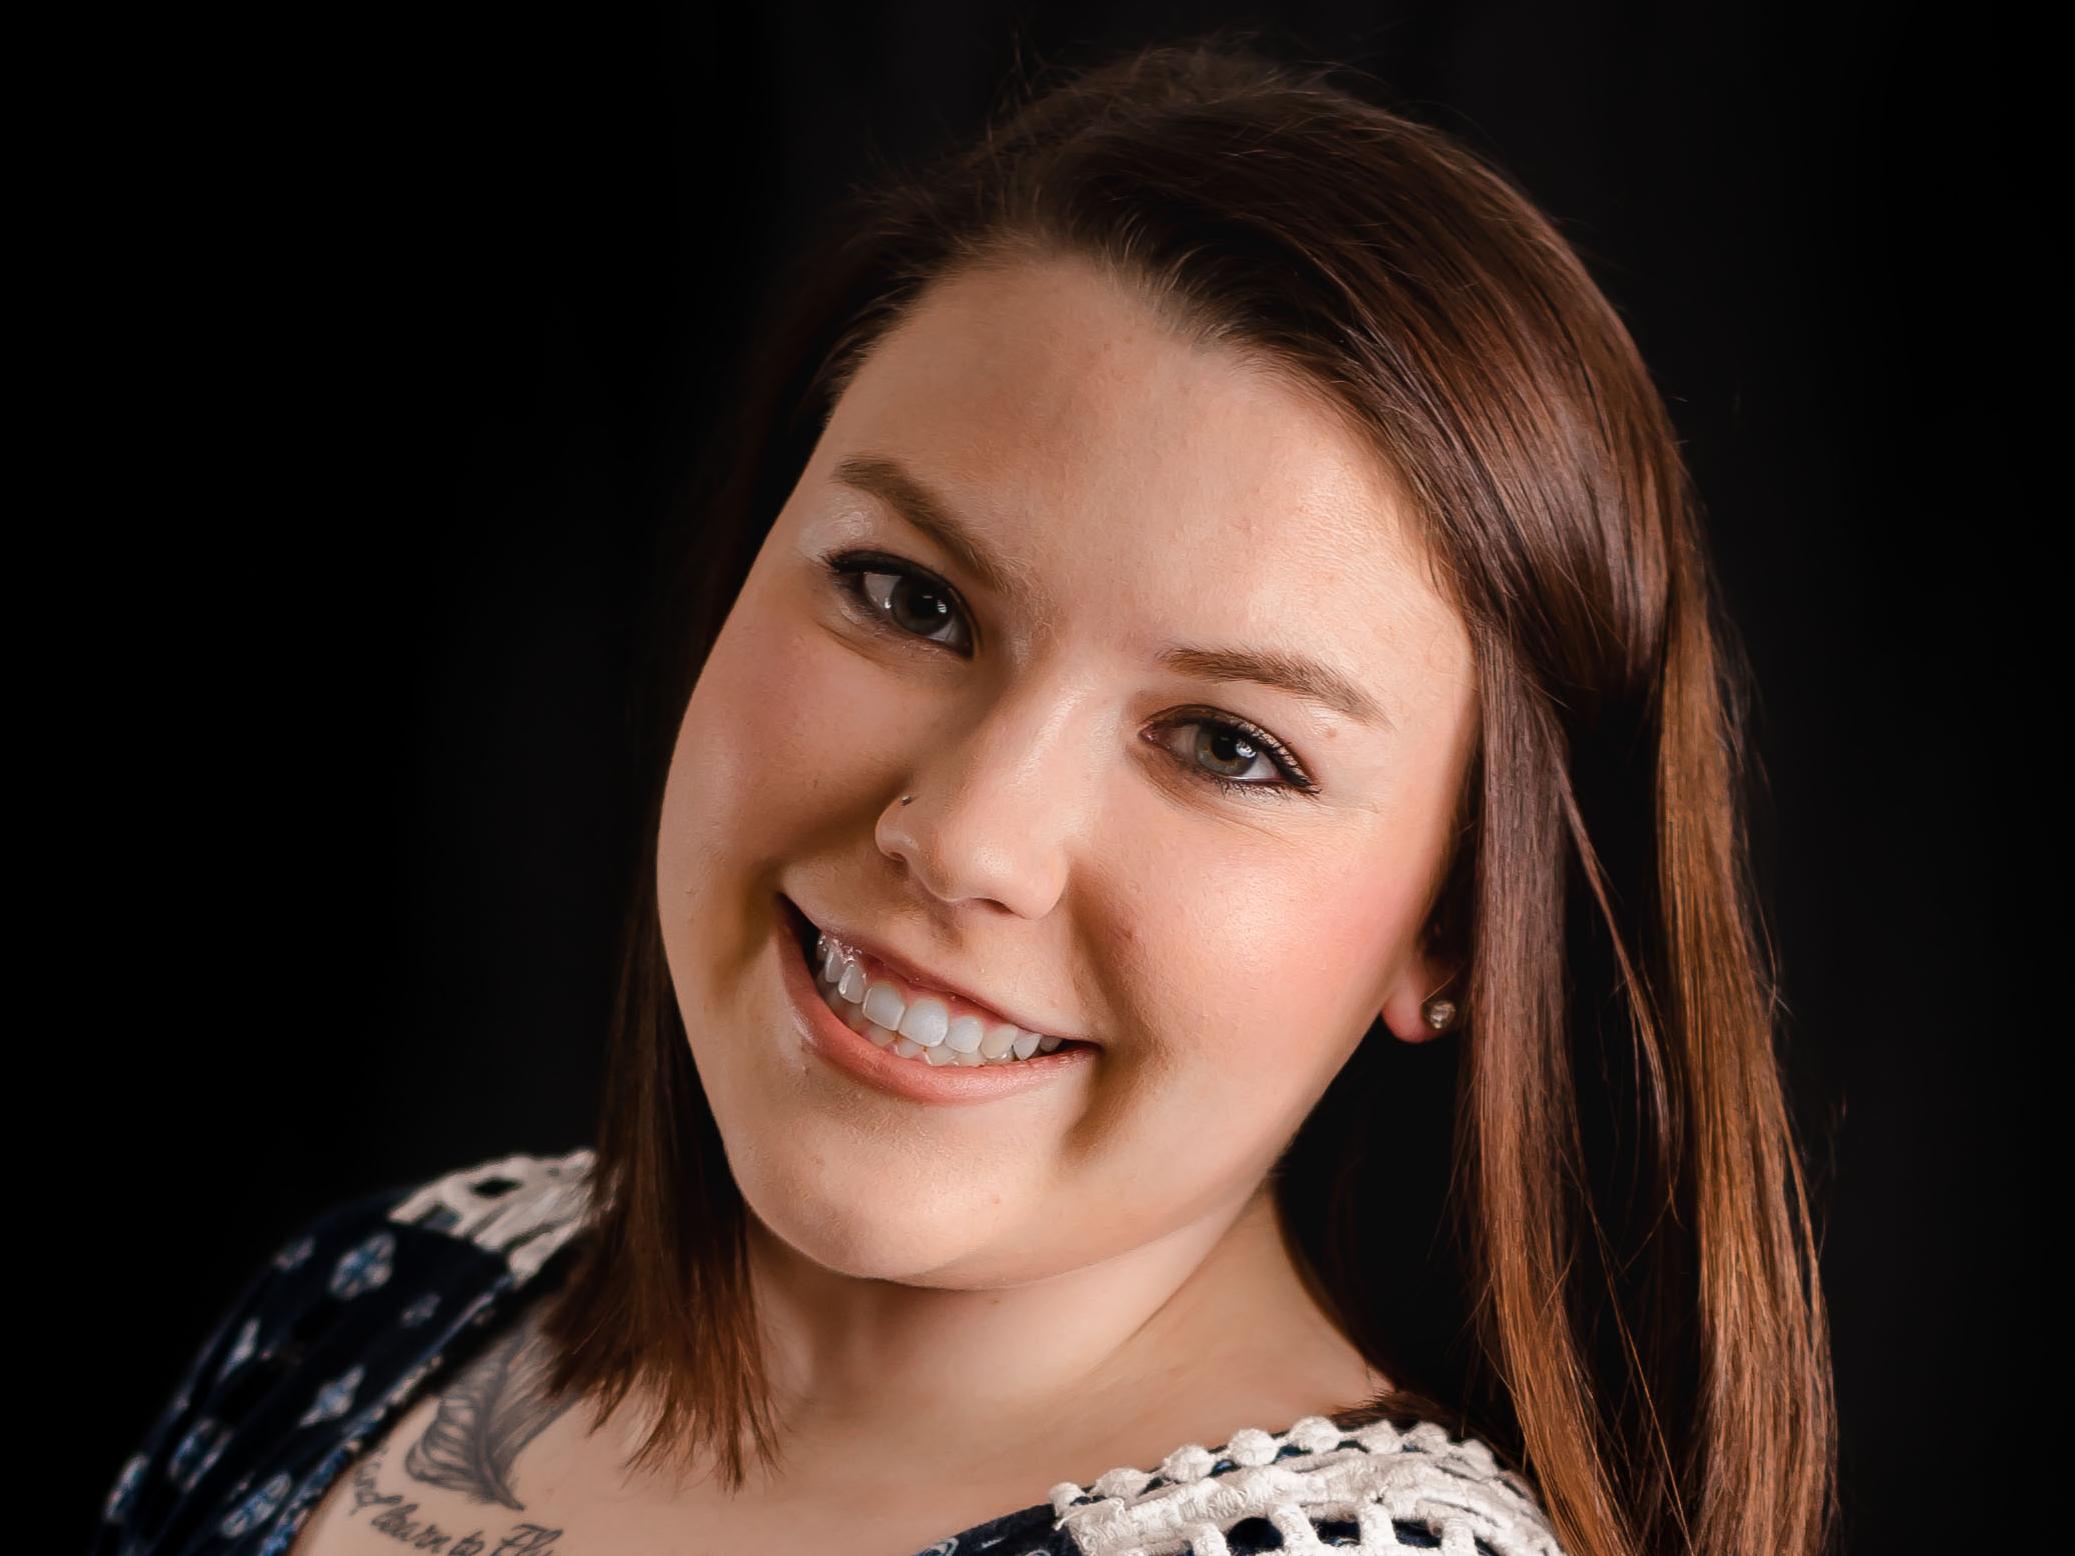 Contestant # 2: Brooke Doescher